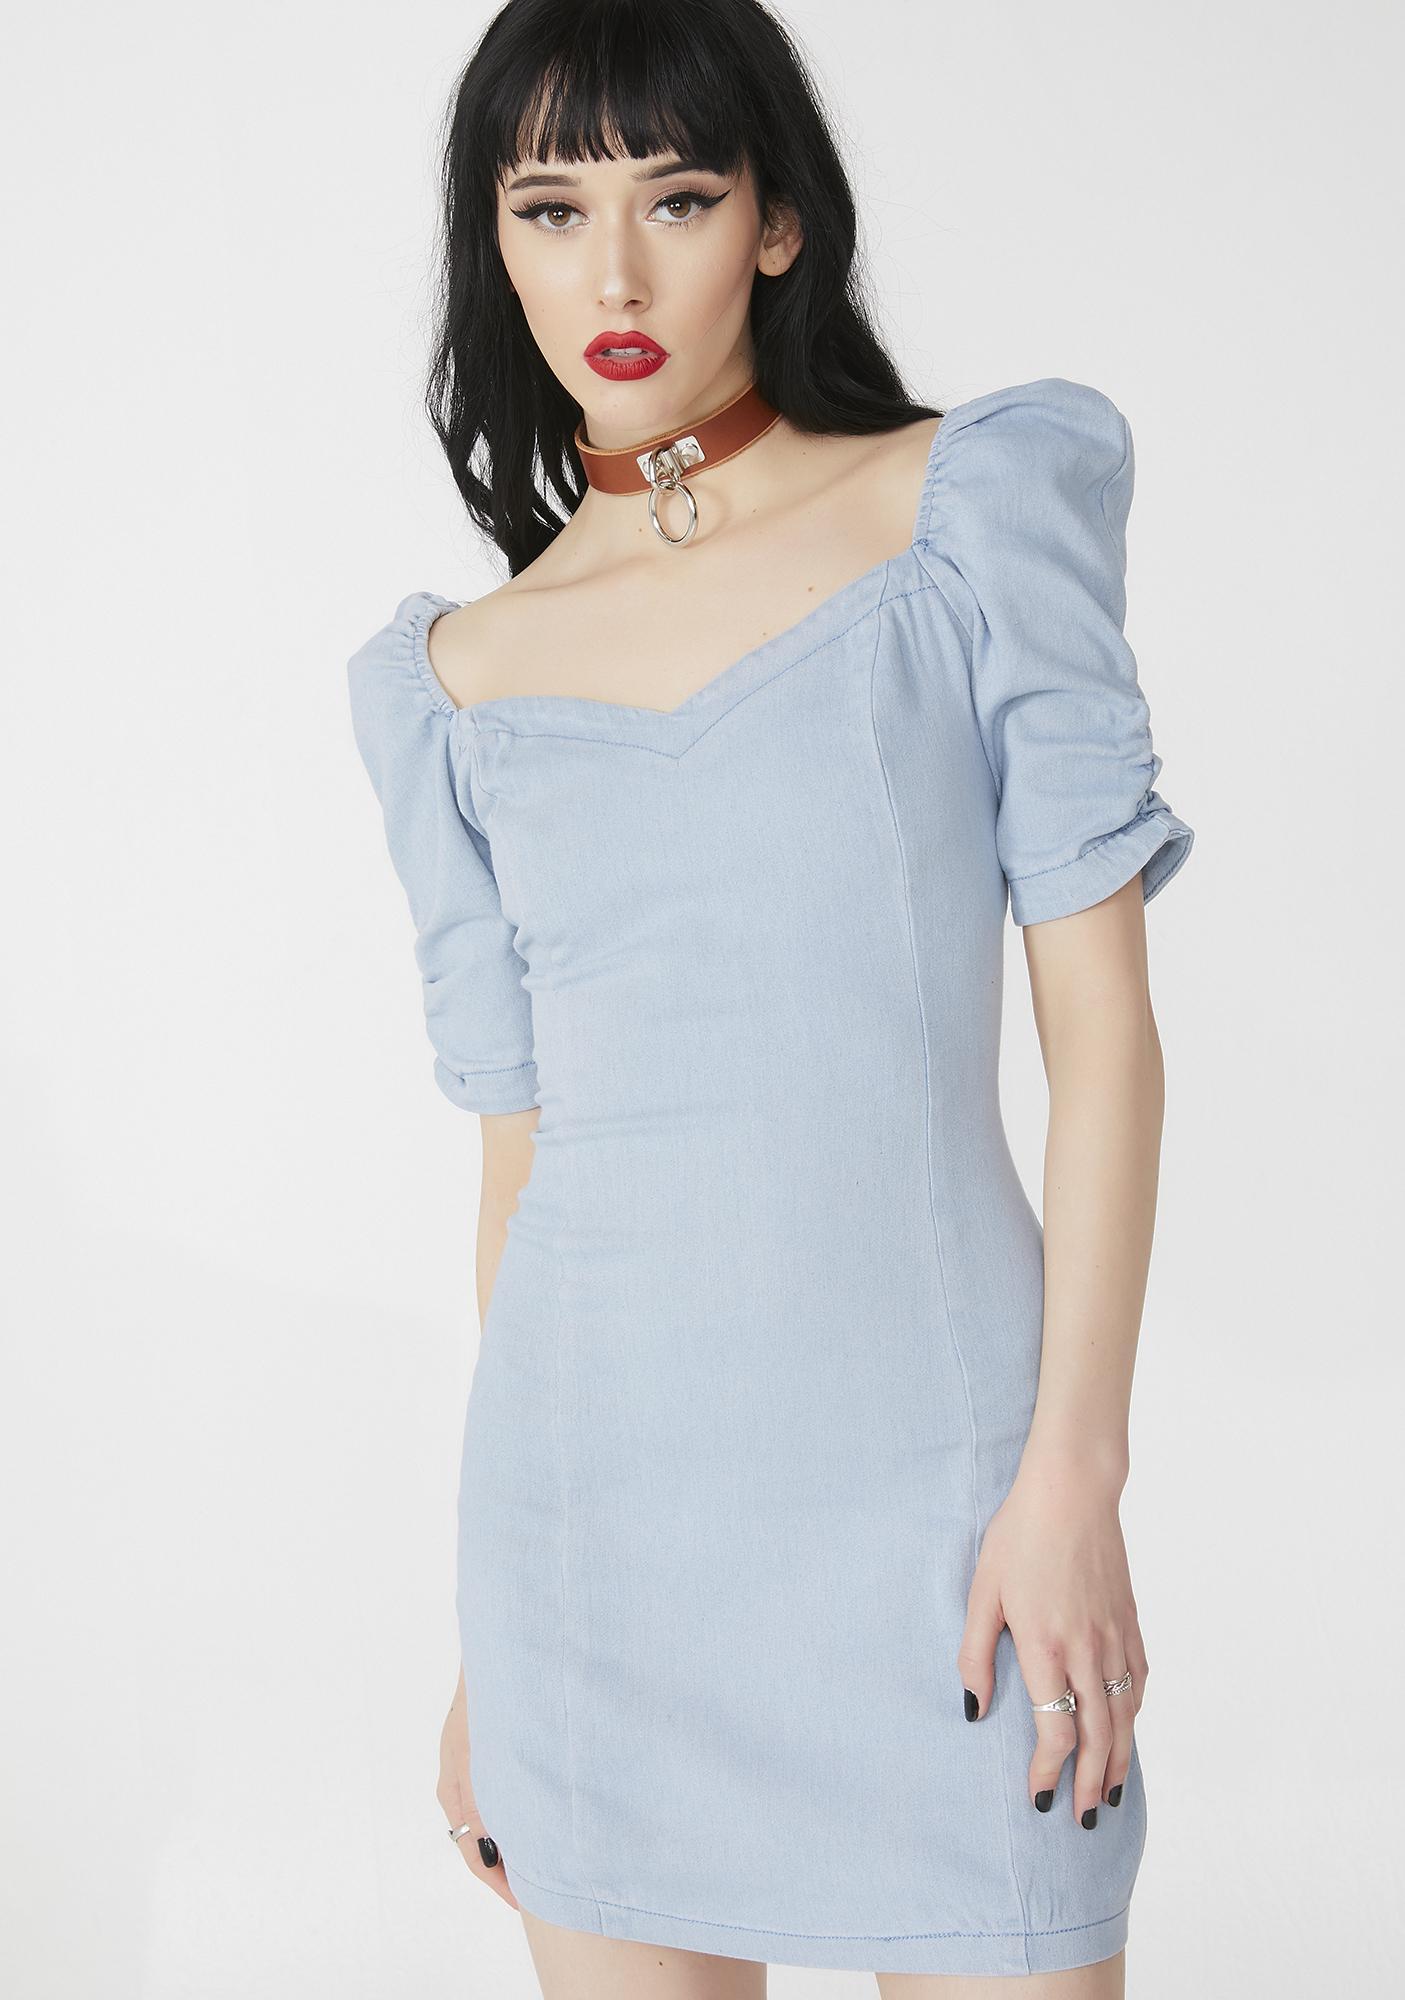 Classy Effect Mini Dress